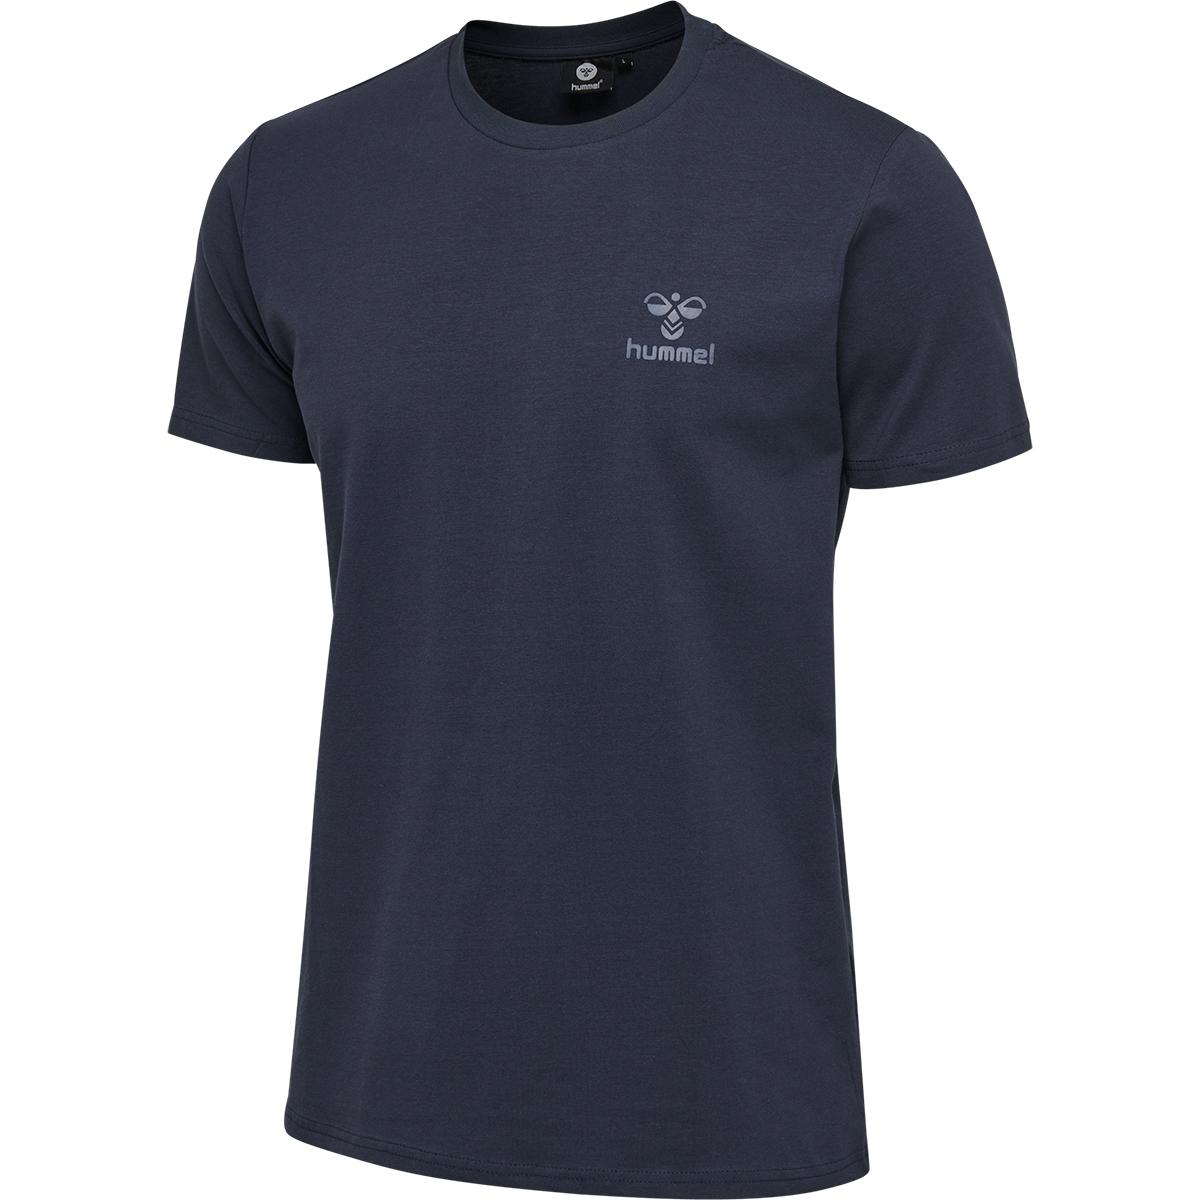 Hummel Sigge t-shirt, marineblå, large